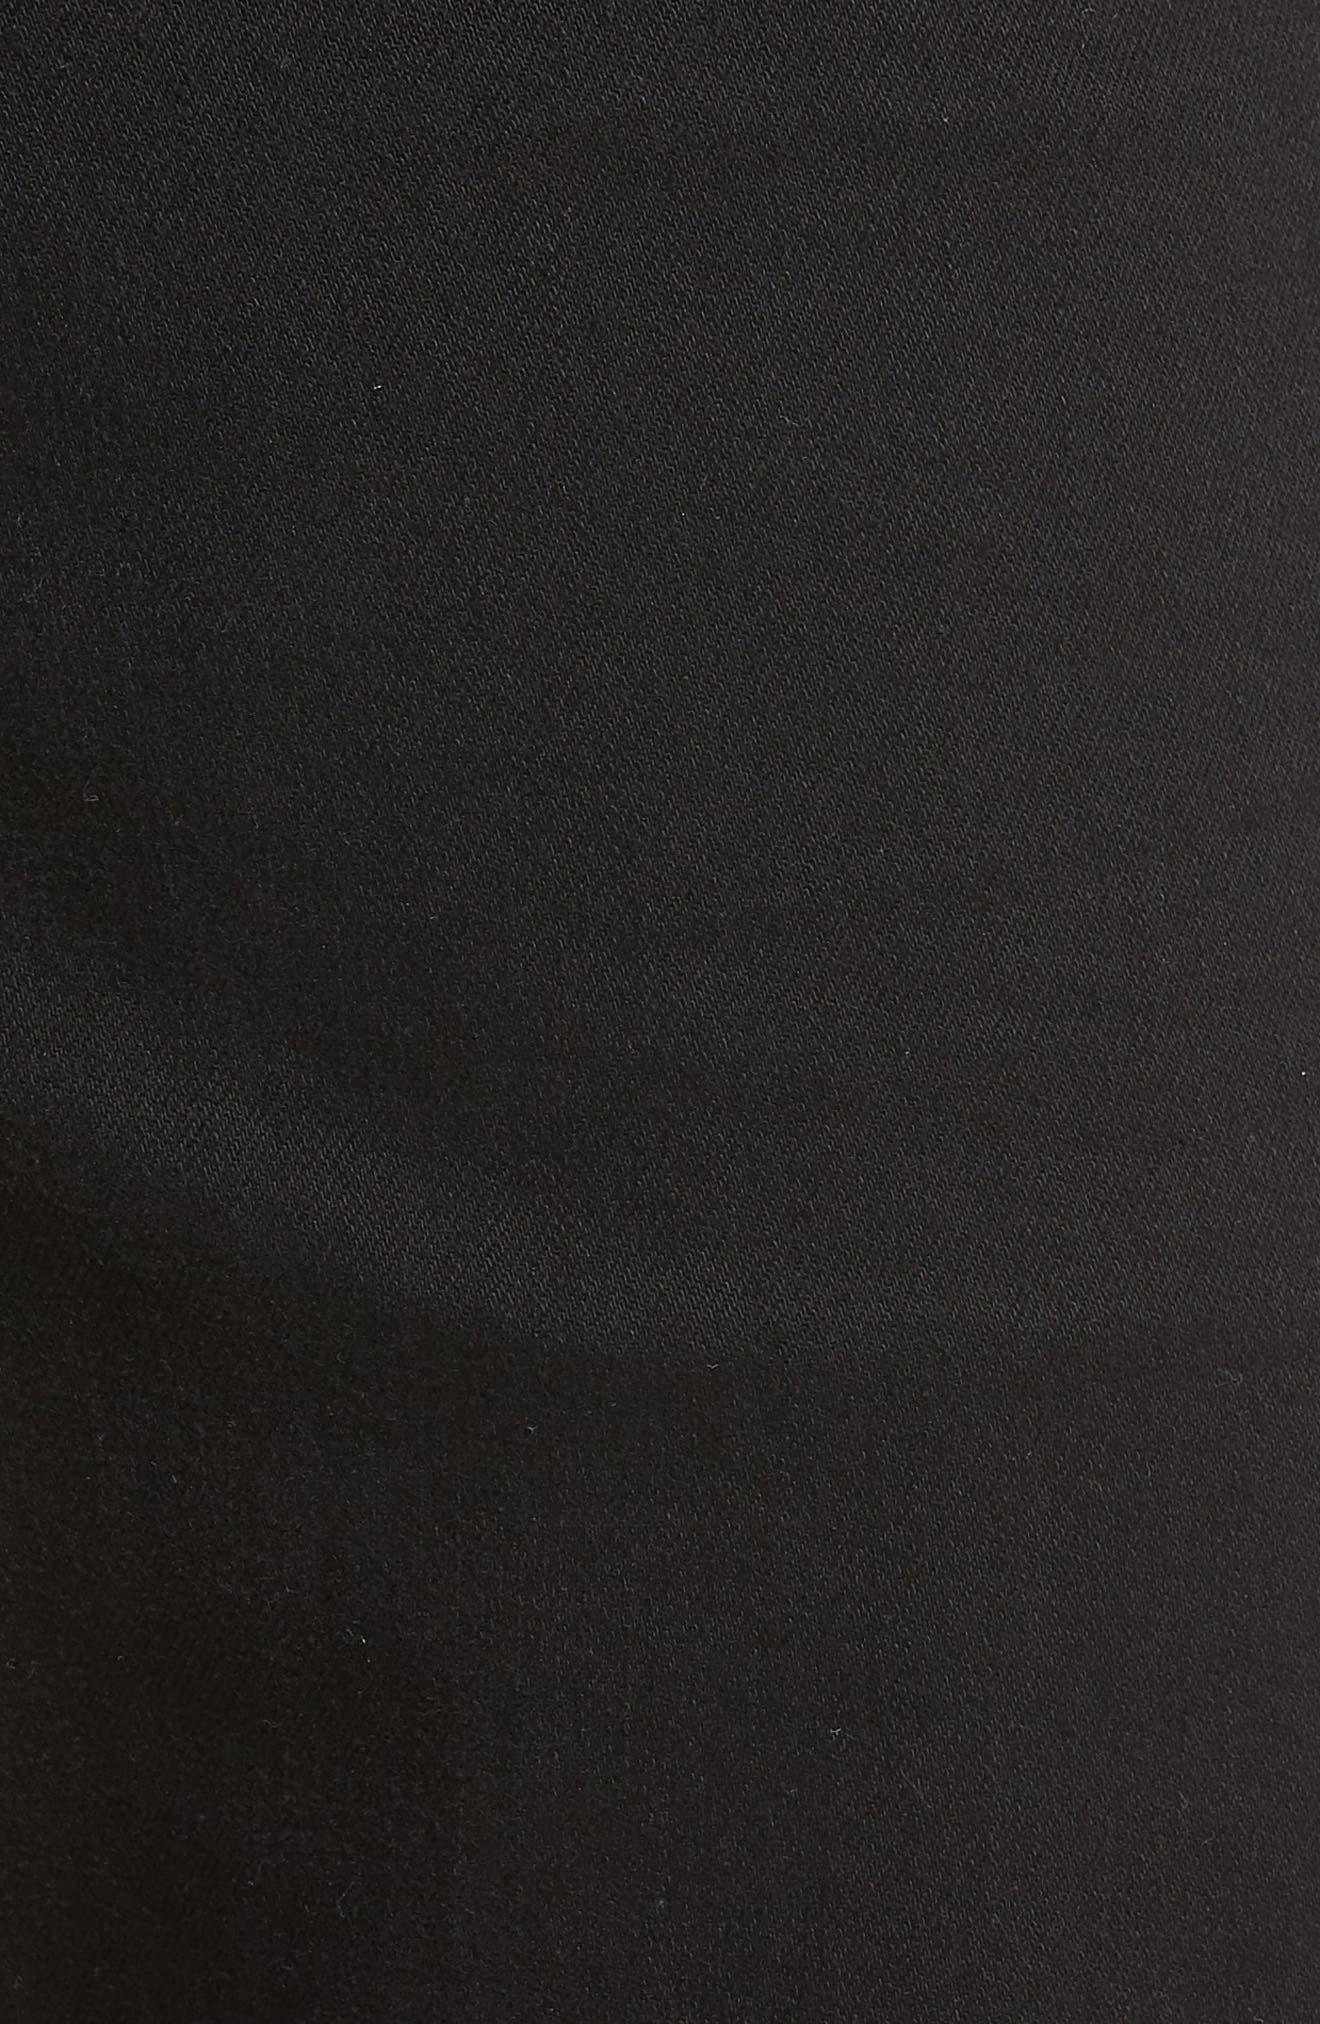 Blake Slim Fit Jeans,                             Alternate thumbnail 5, color,                             002